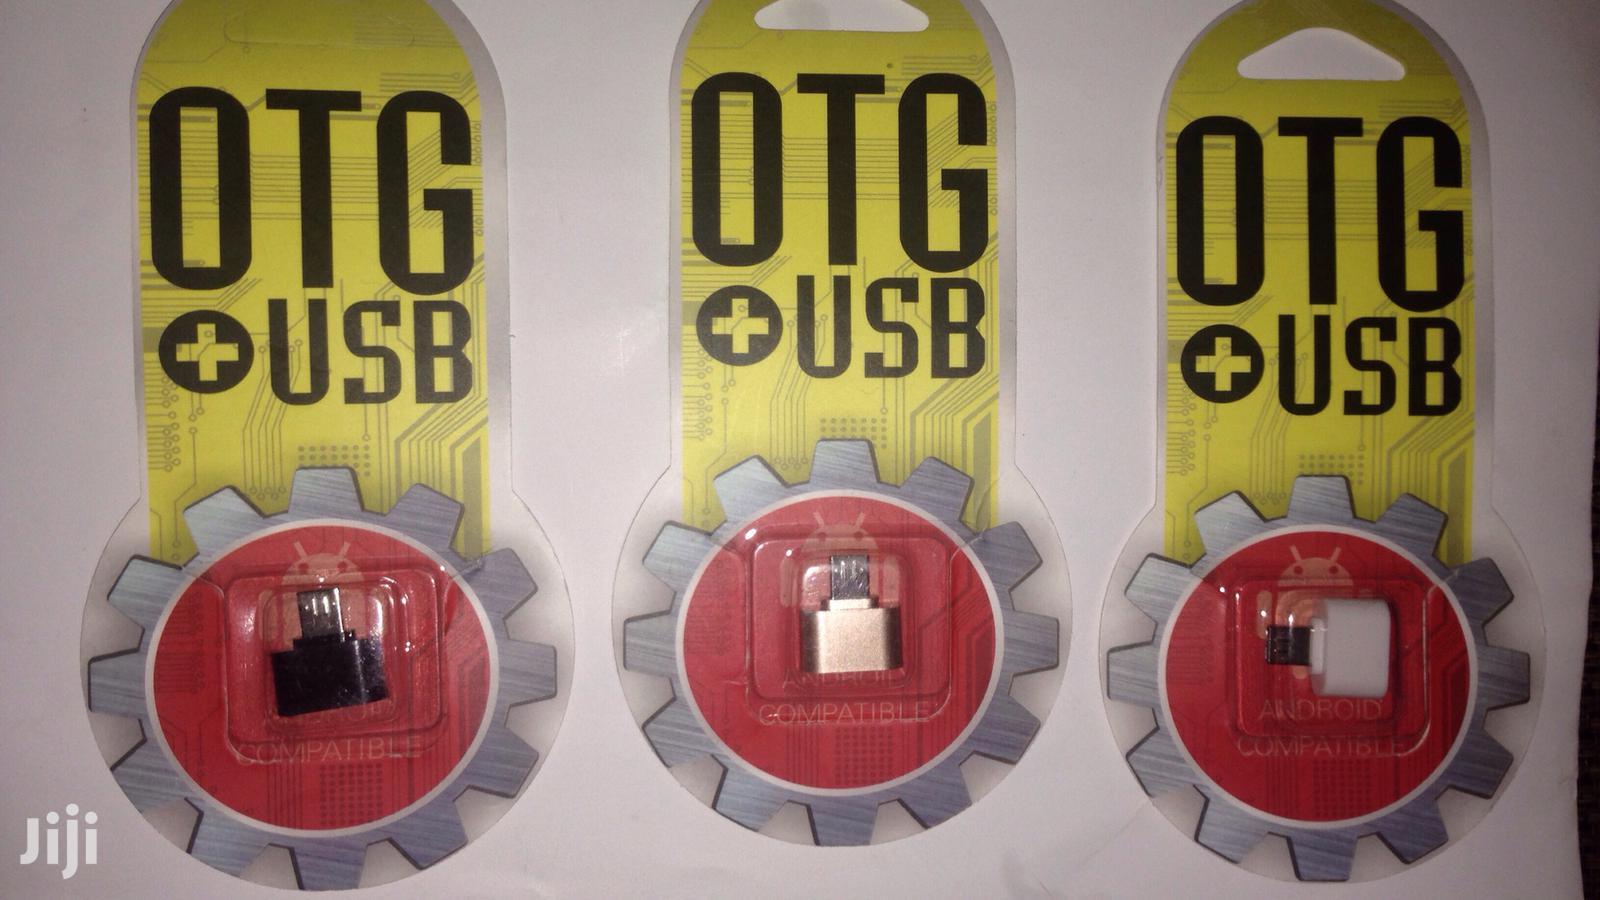 Mini OTG Cable USB OTG Adapter Micro USB To USB